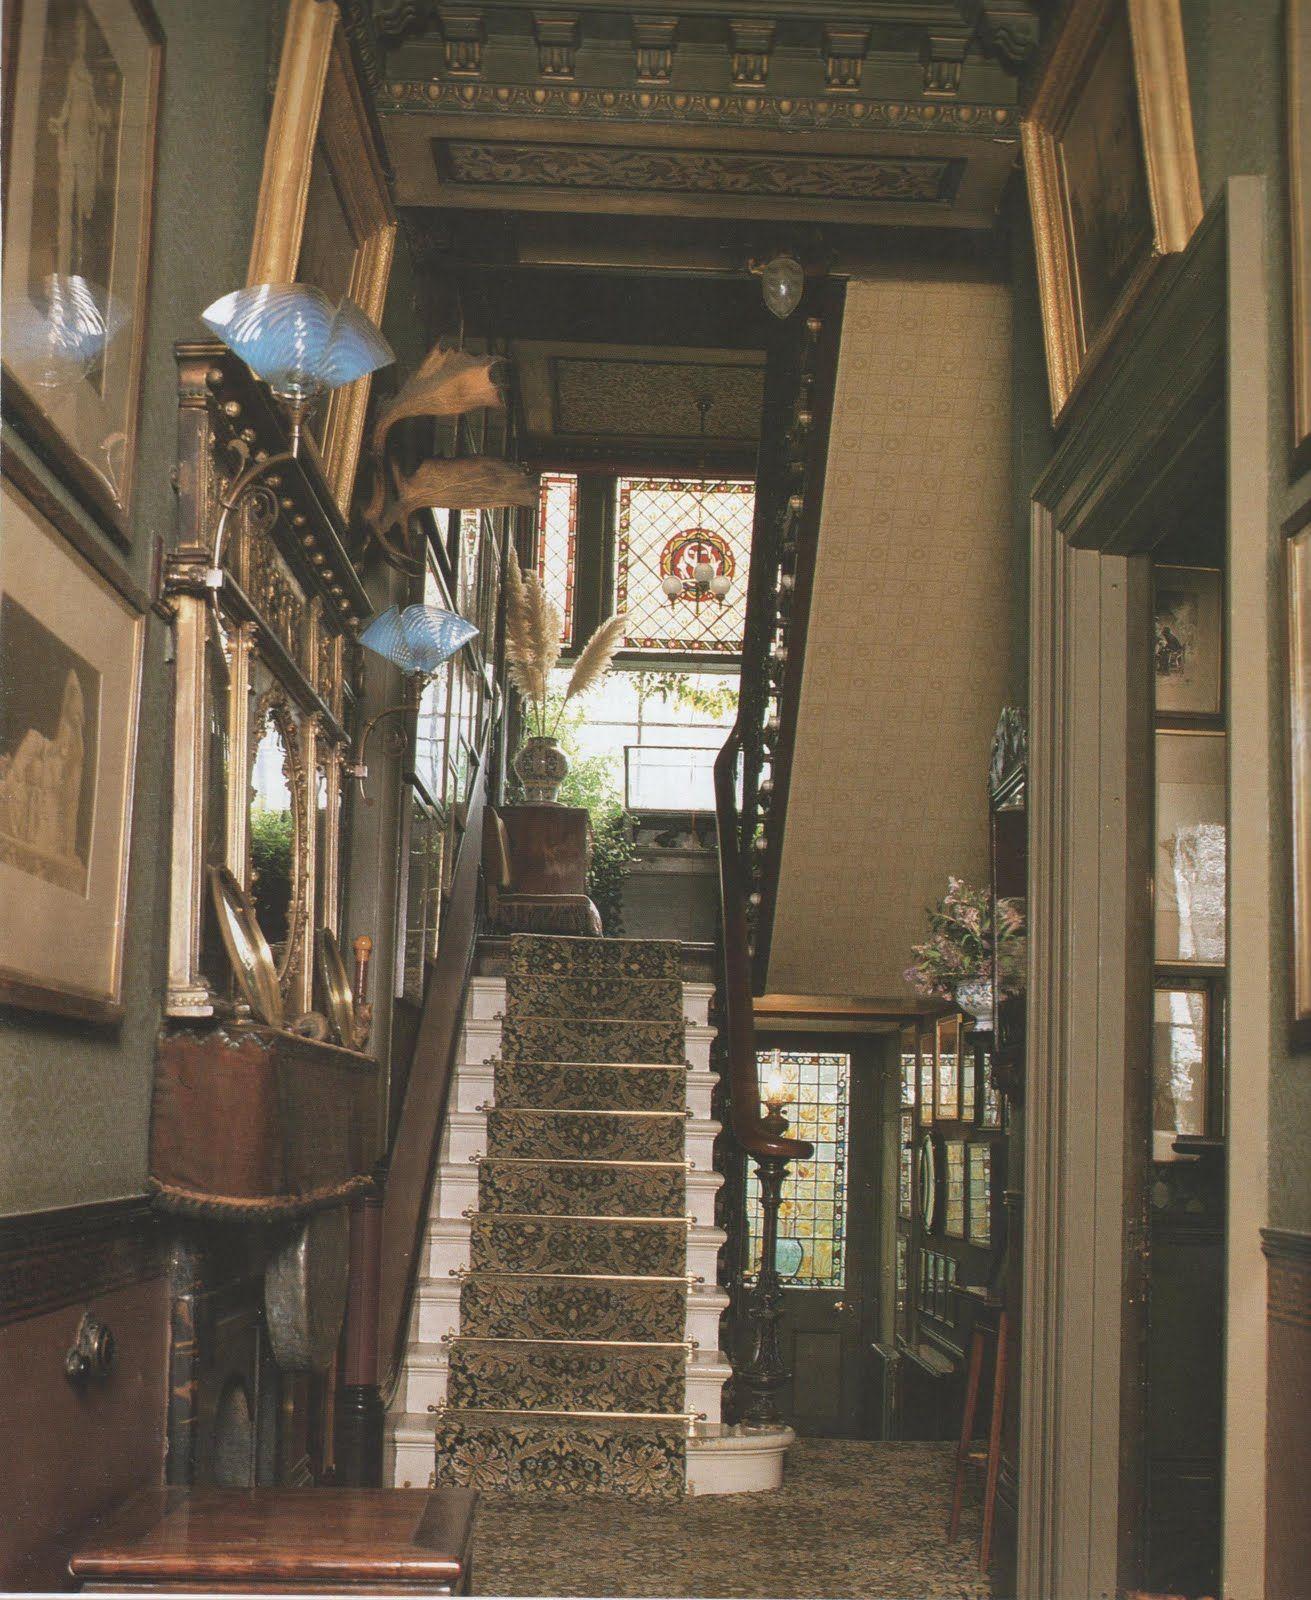 Victorian Literature: A Victorian